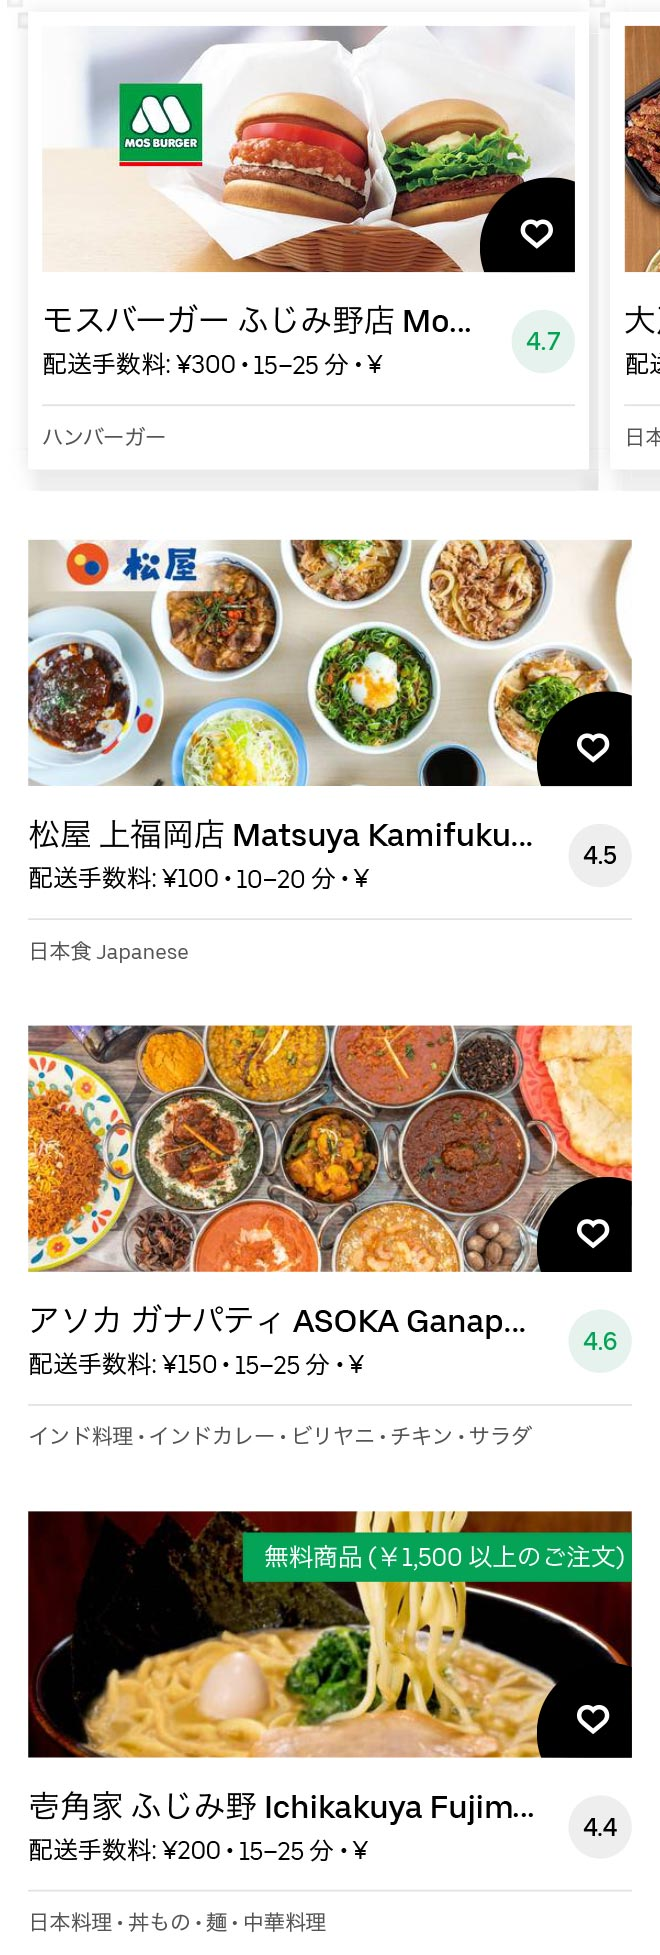 Kamifukuoka menu 2011 02